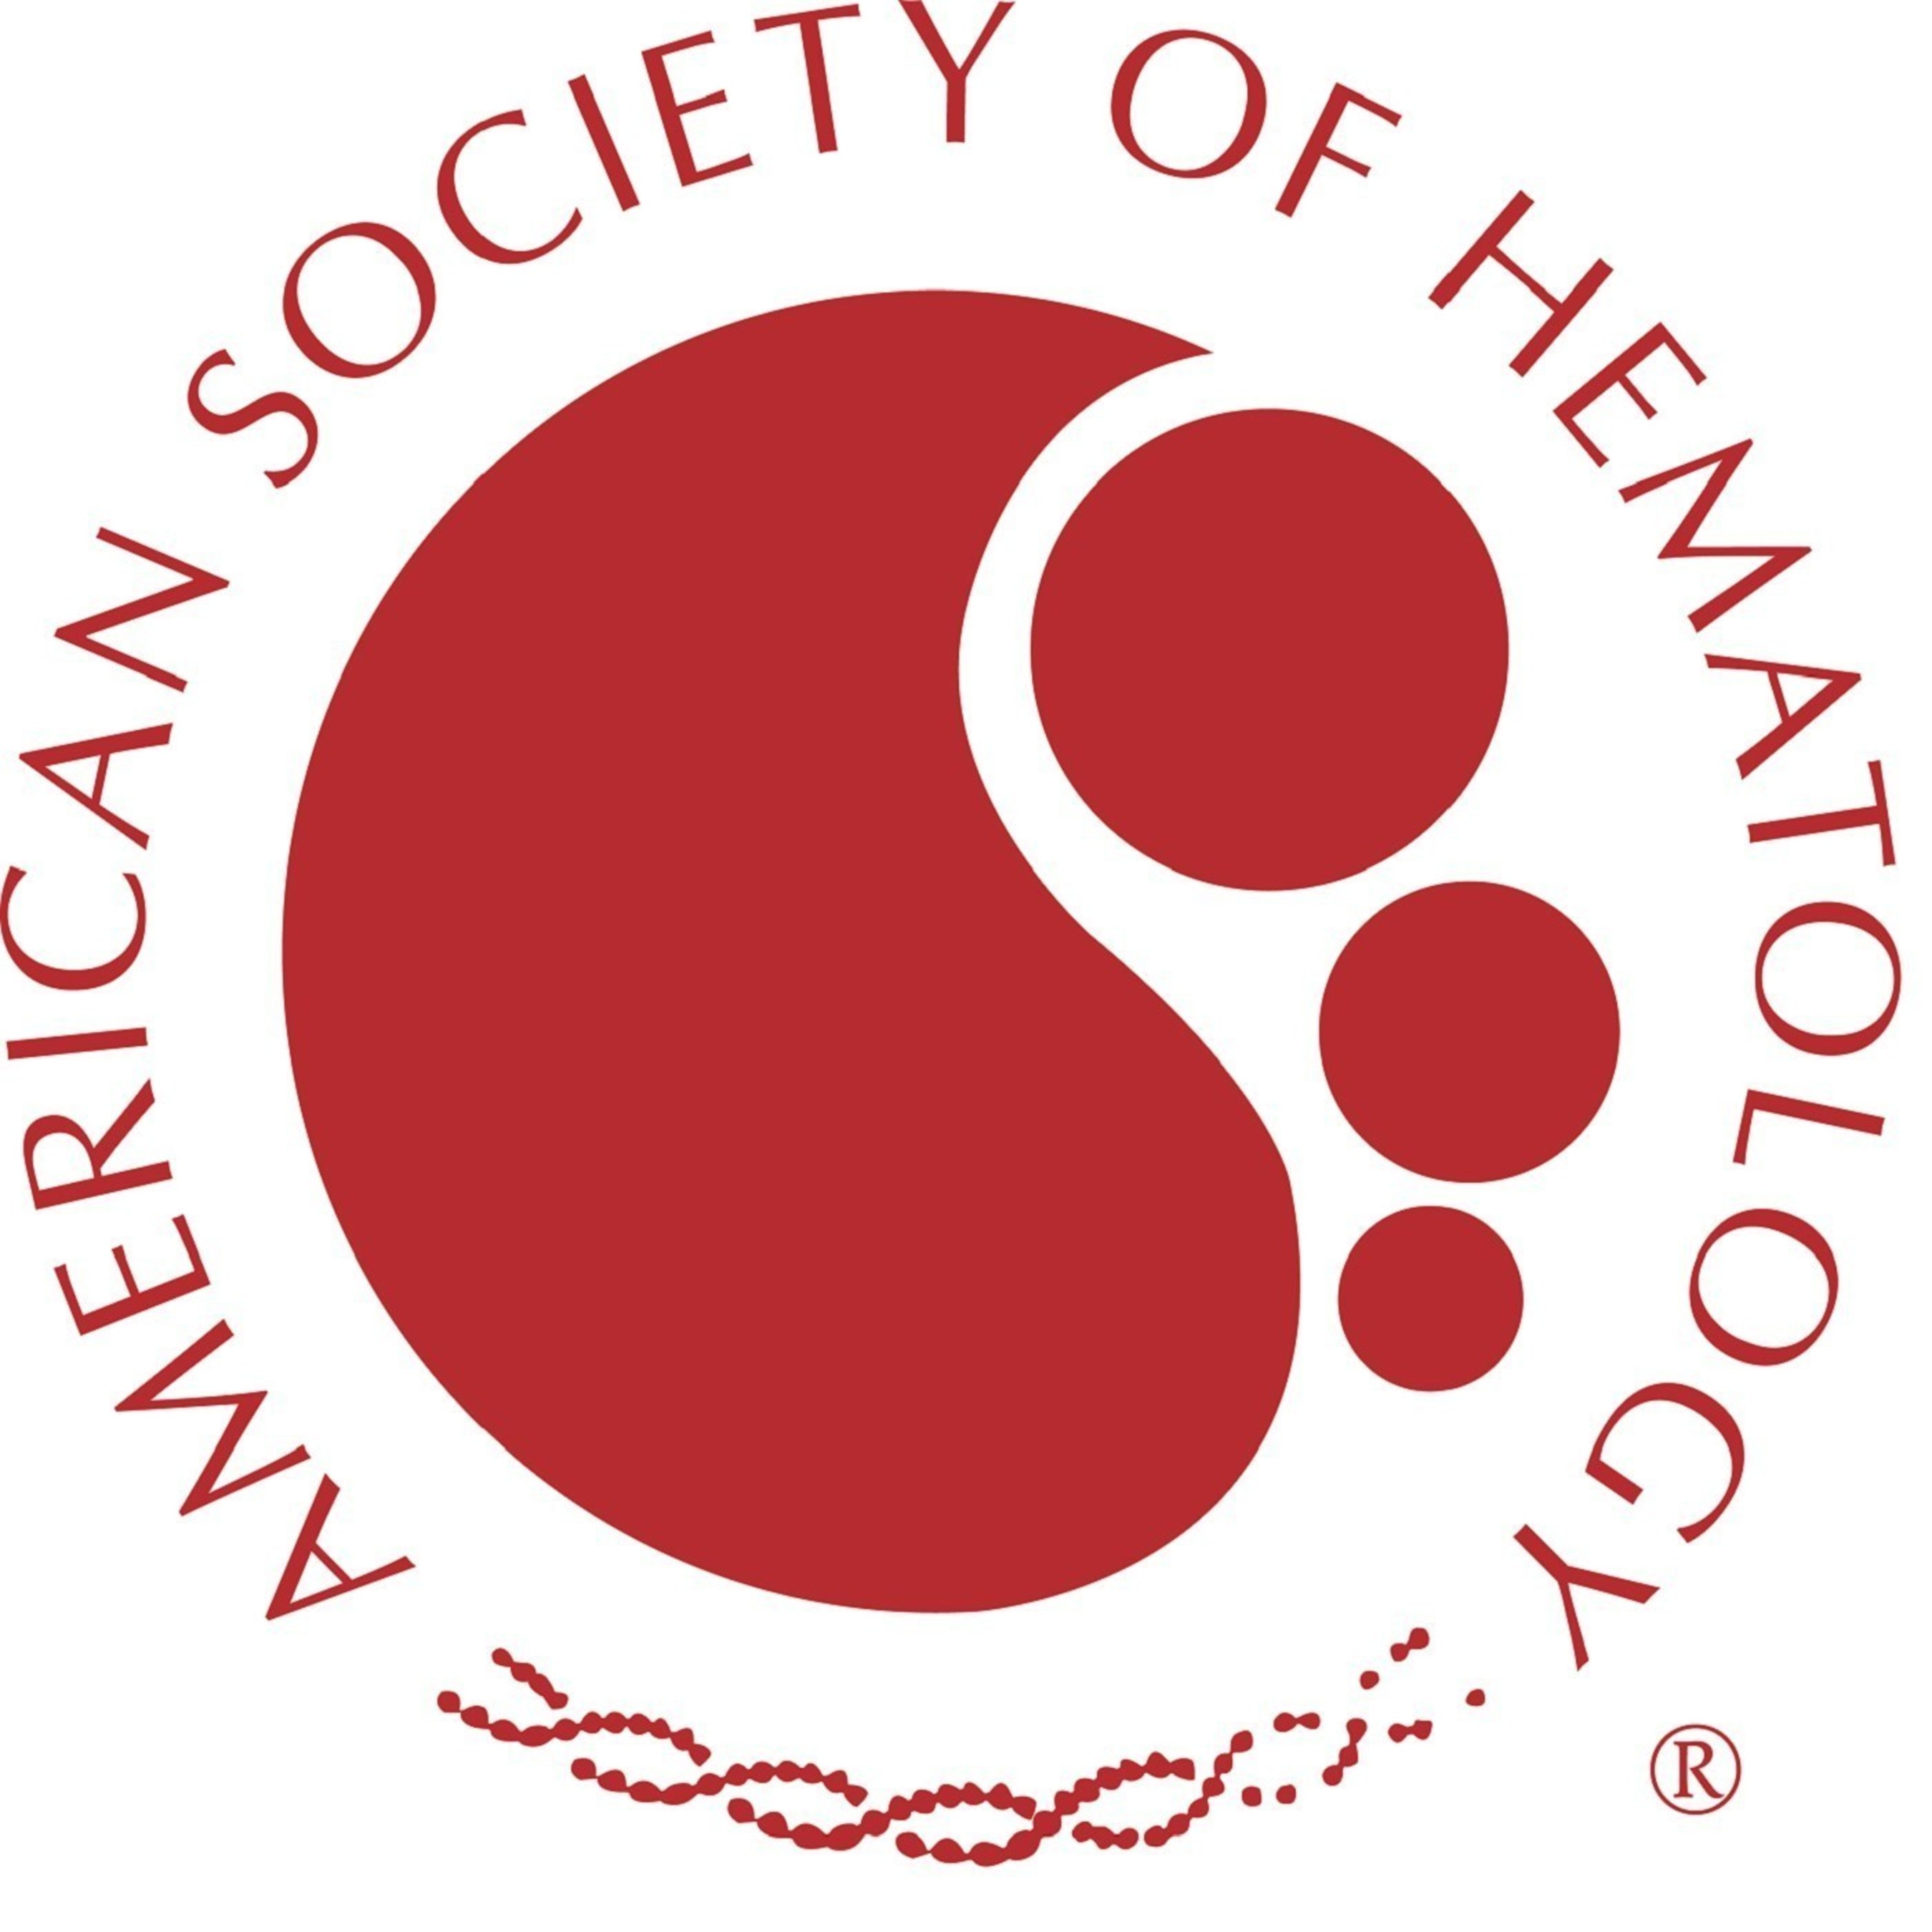 American Society of Hematology logo.